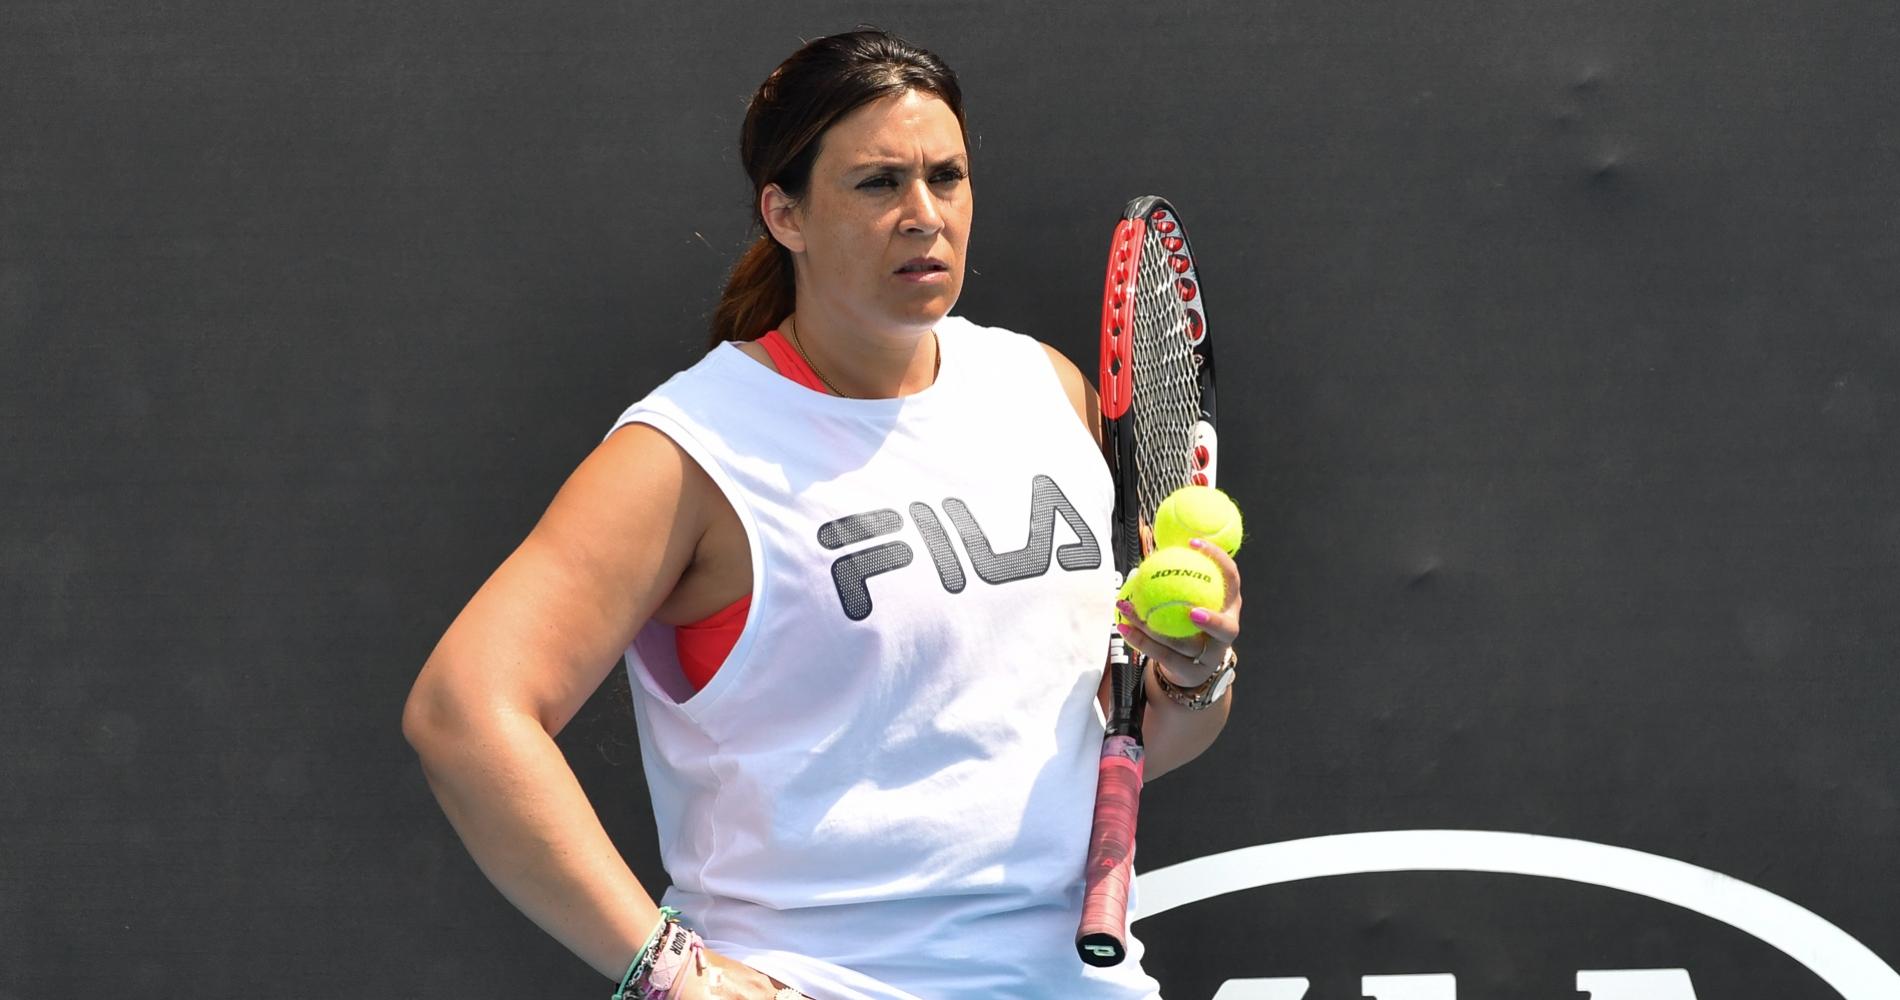 Marion Bartoli, Jelena Ostapenko's coach during 2020 Australian Open